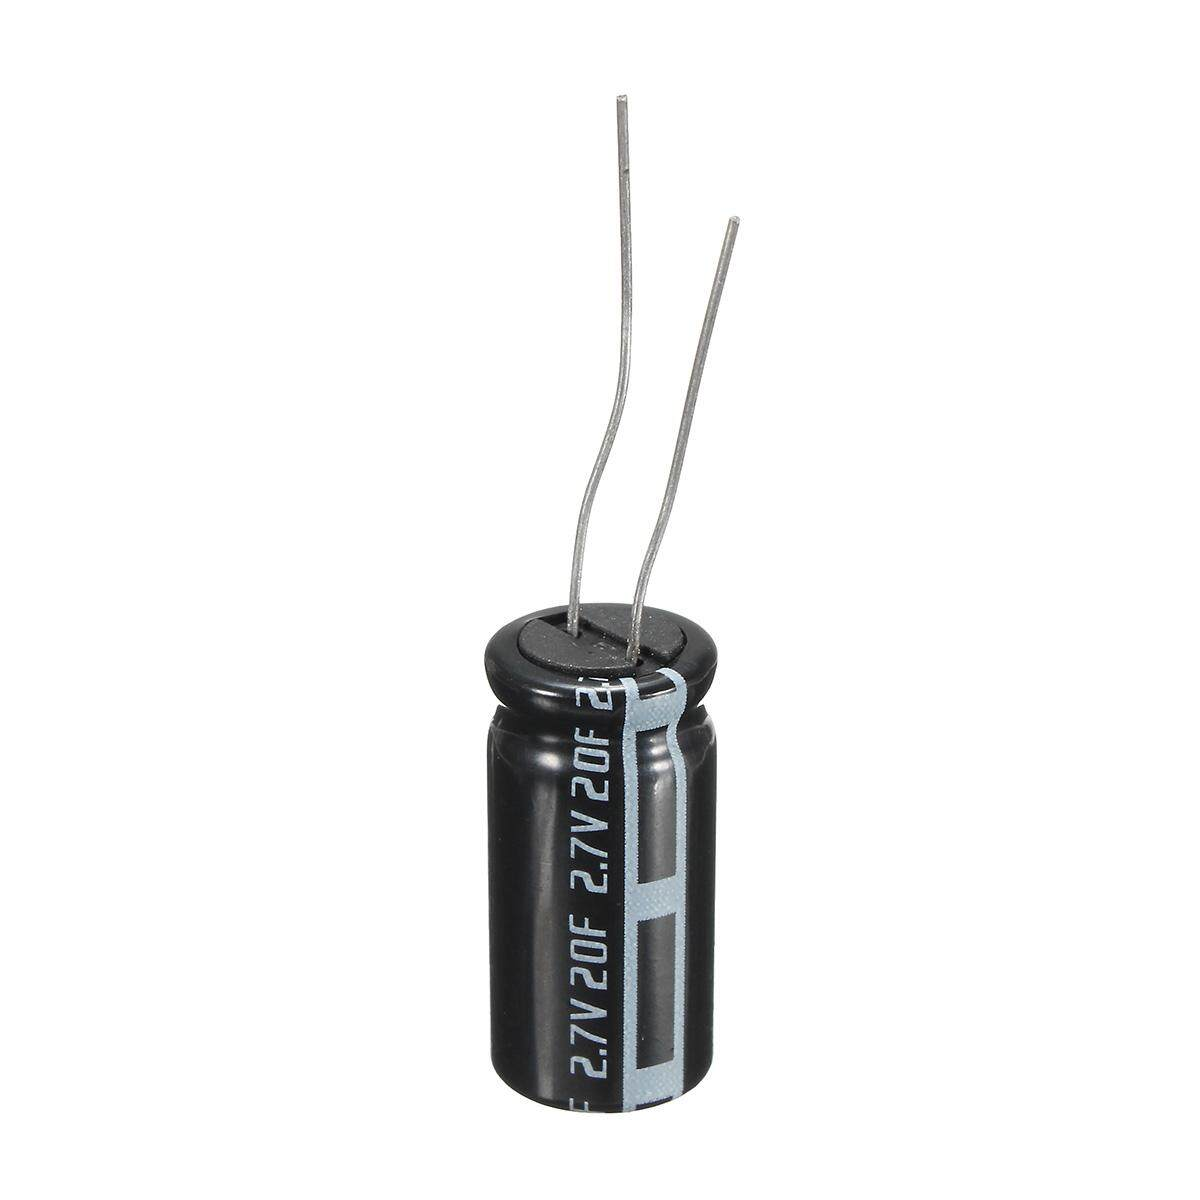 1Pcs 2.7V 20Farad Cylindrical Super Farad Ultra Capacitor High Power Supercap - intl